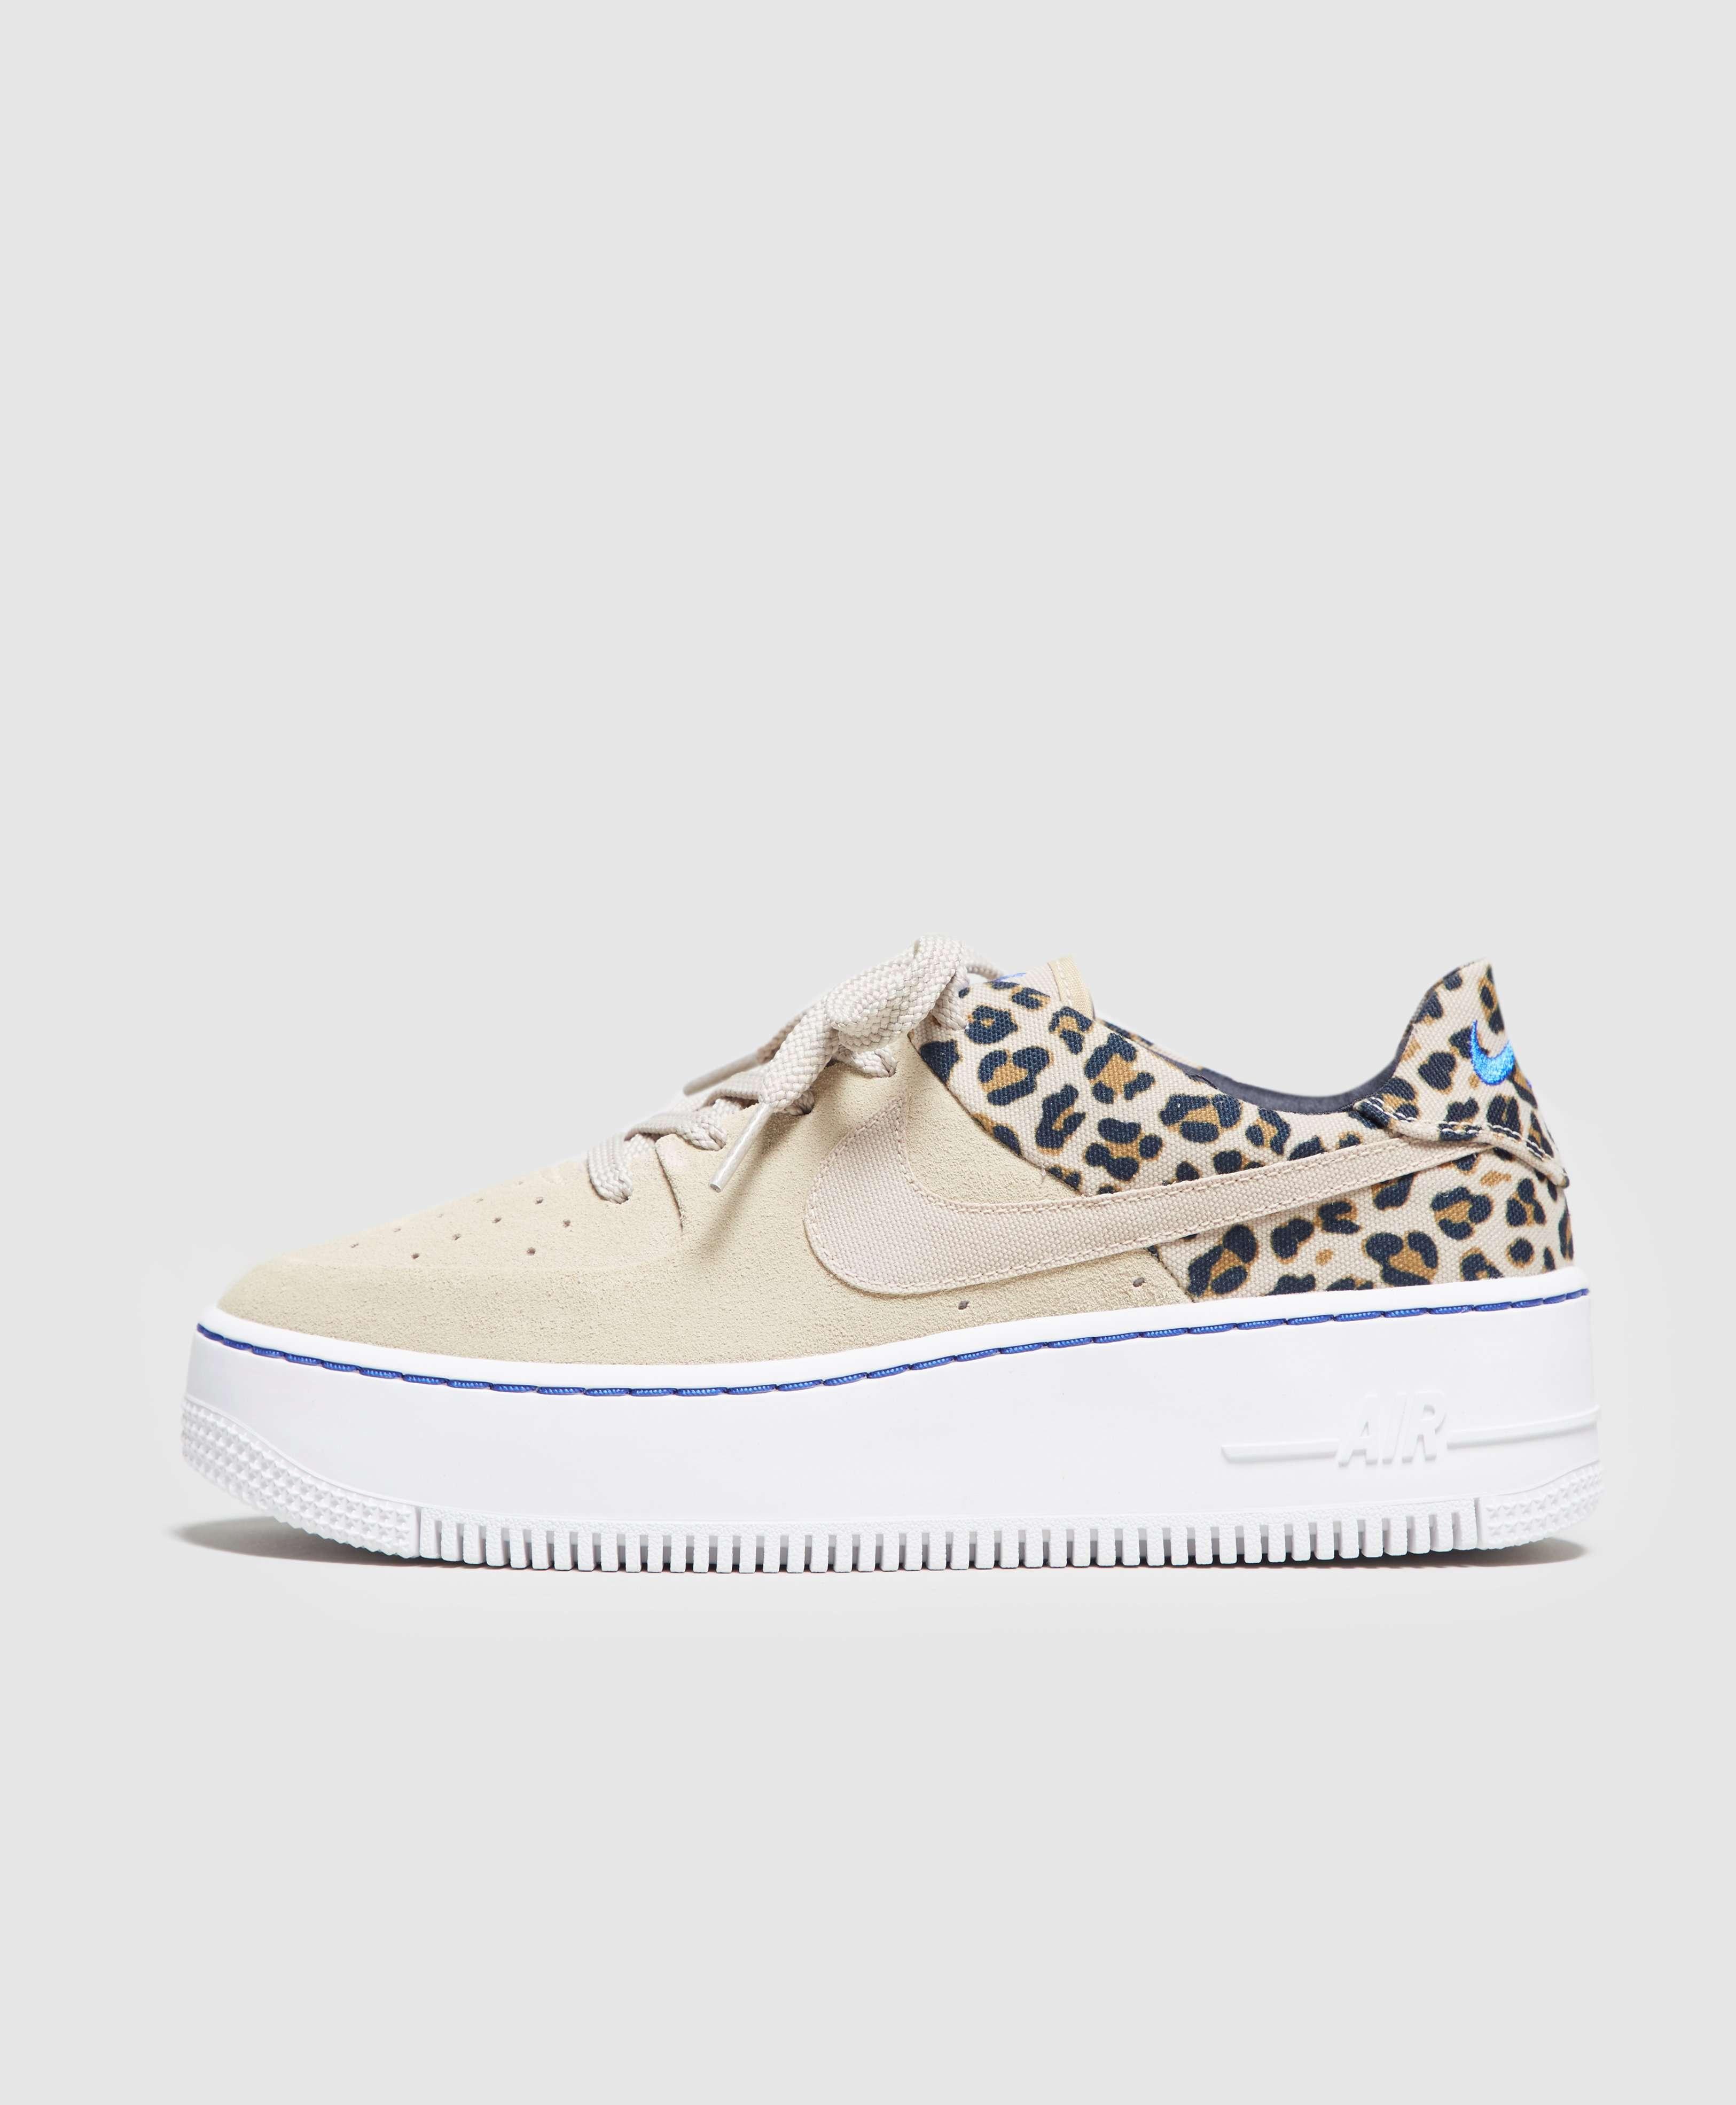 Nike Air Force 1 Sage 'Leopard' Women's